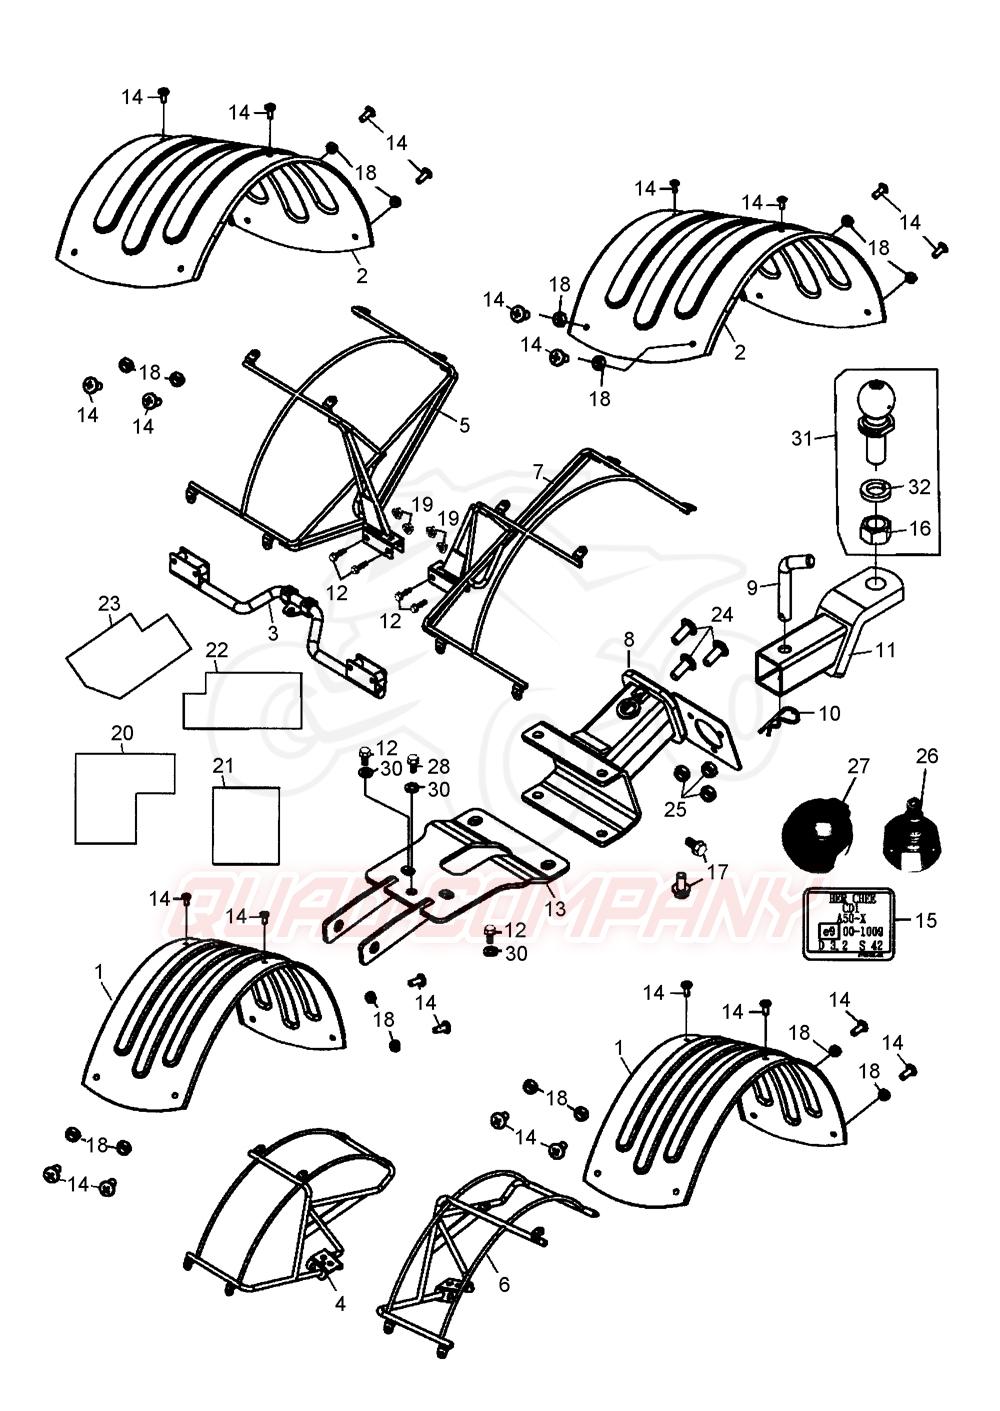 beeline bestia 5 5 offroad lof radabdeckung anh ngekupplung ersatzteile. Black Bedroom Furniture Sets. Home Design Ideas